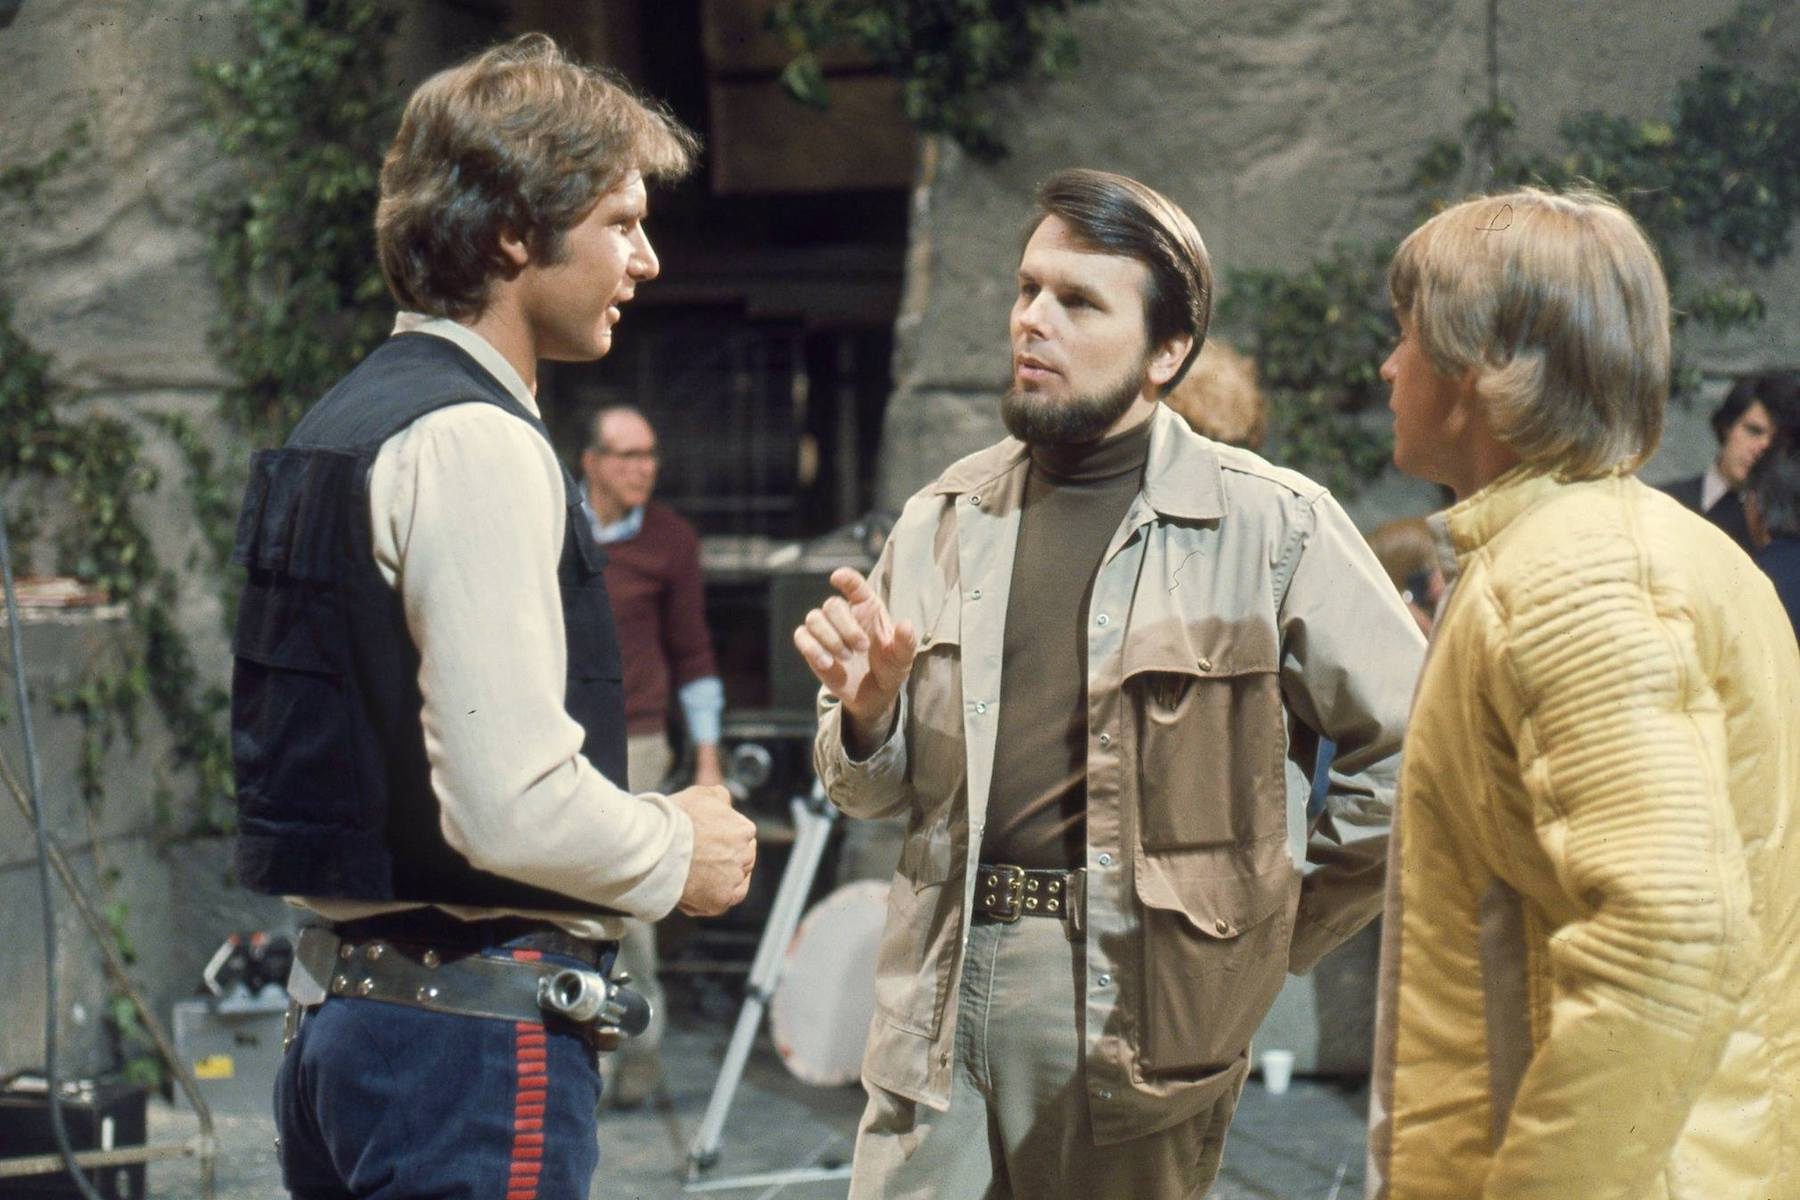 'Star Wars' Producer and Marine Corps Veteran Gary Kurtz Dies at 78